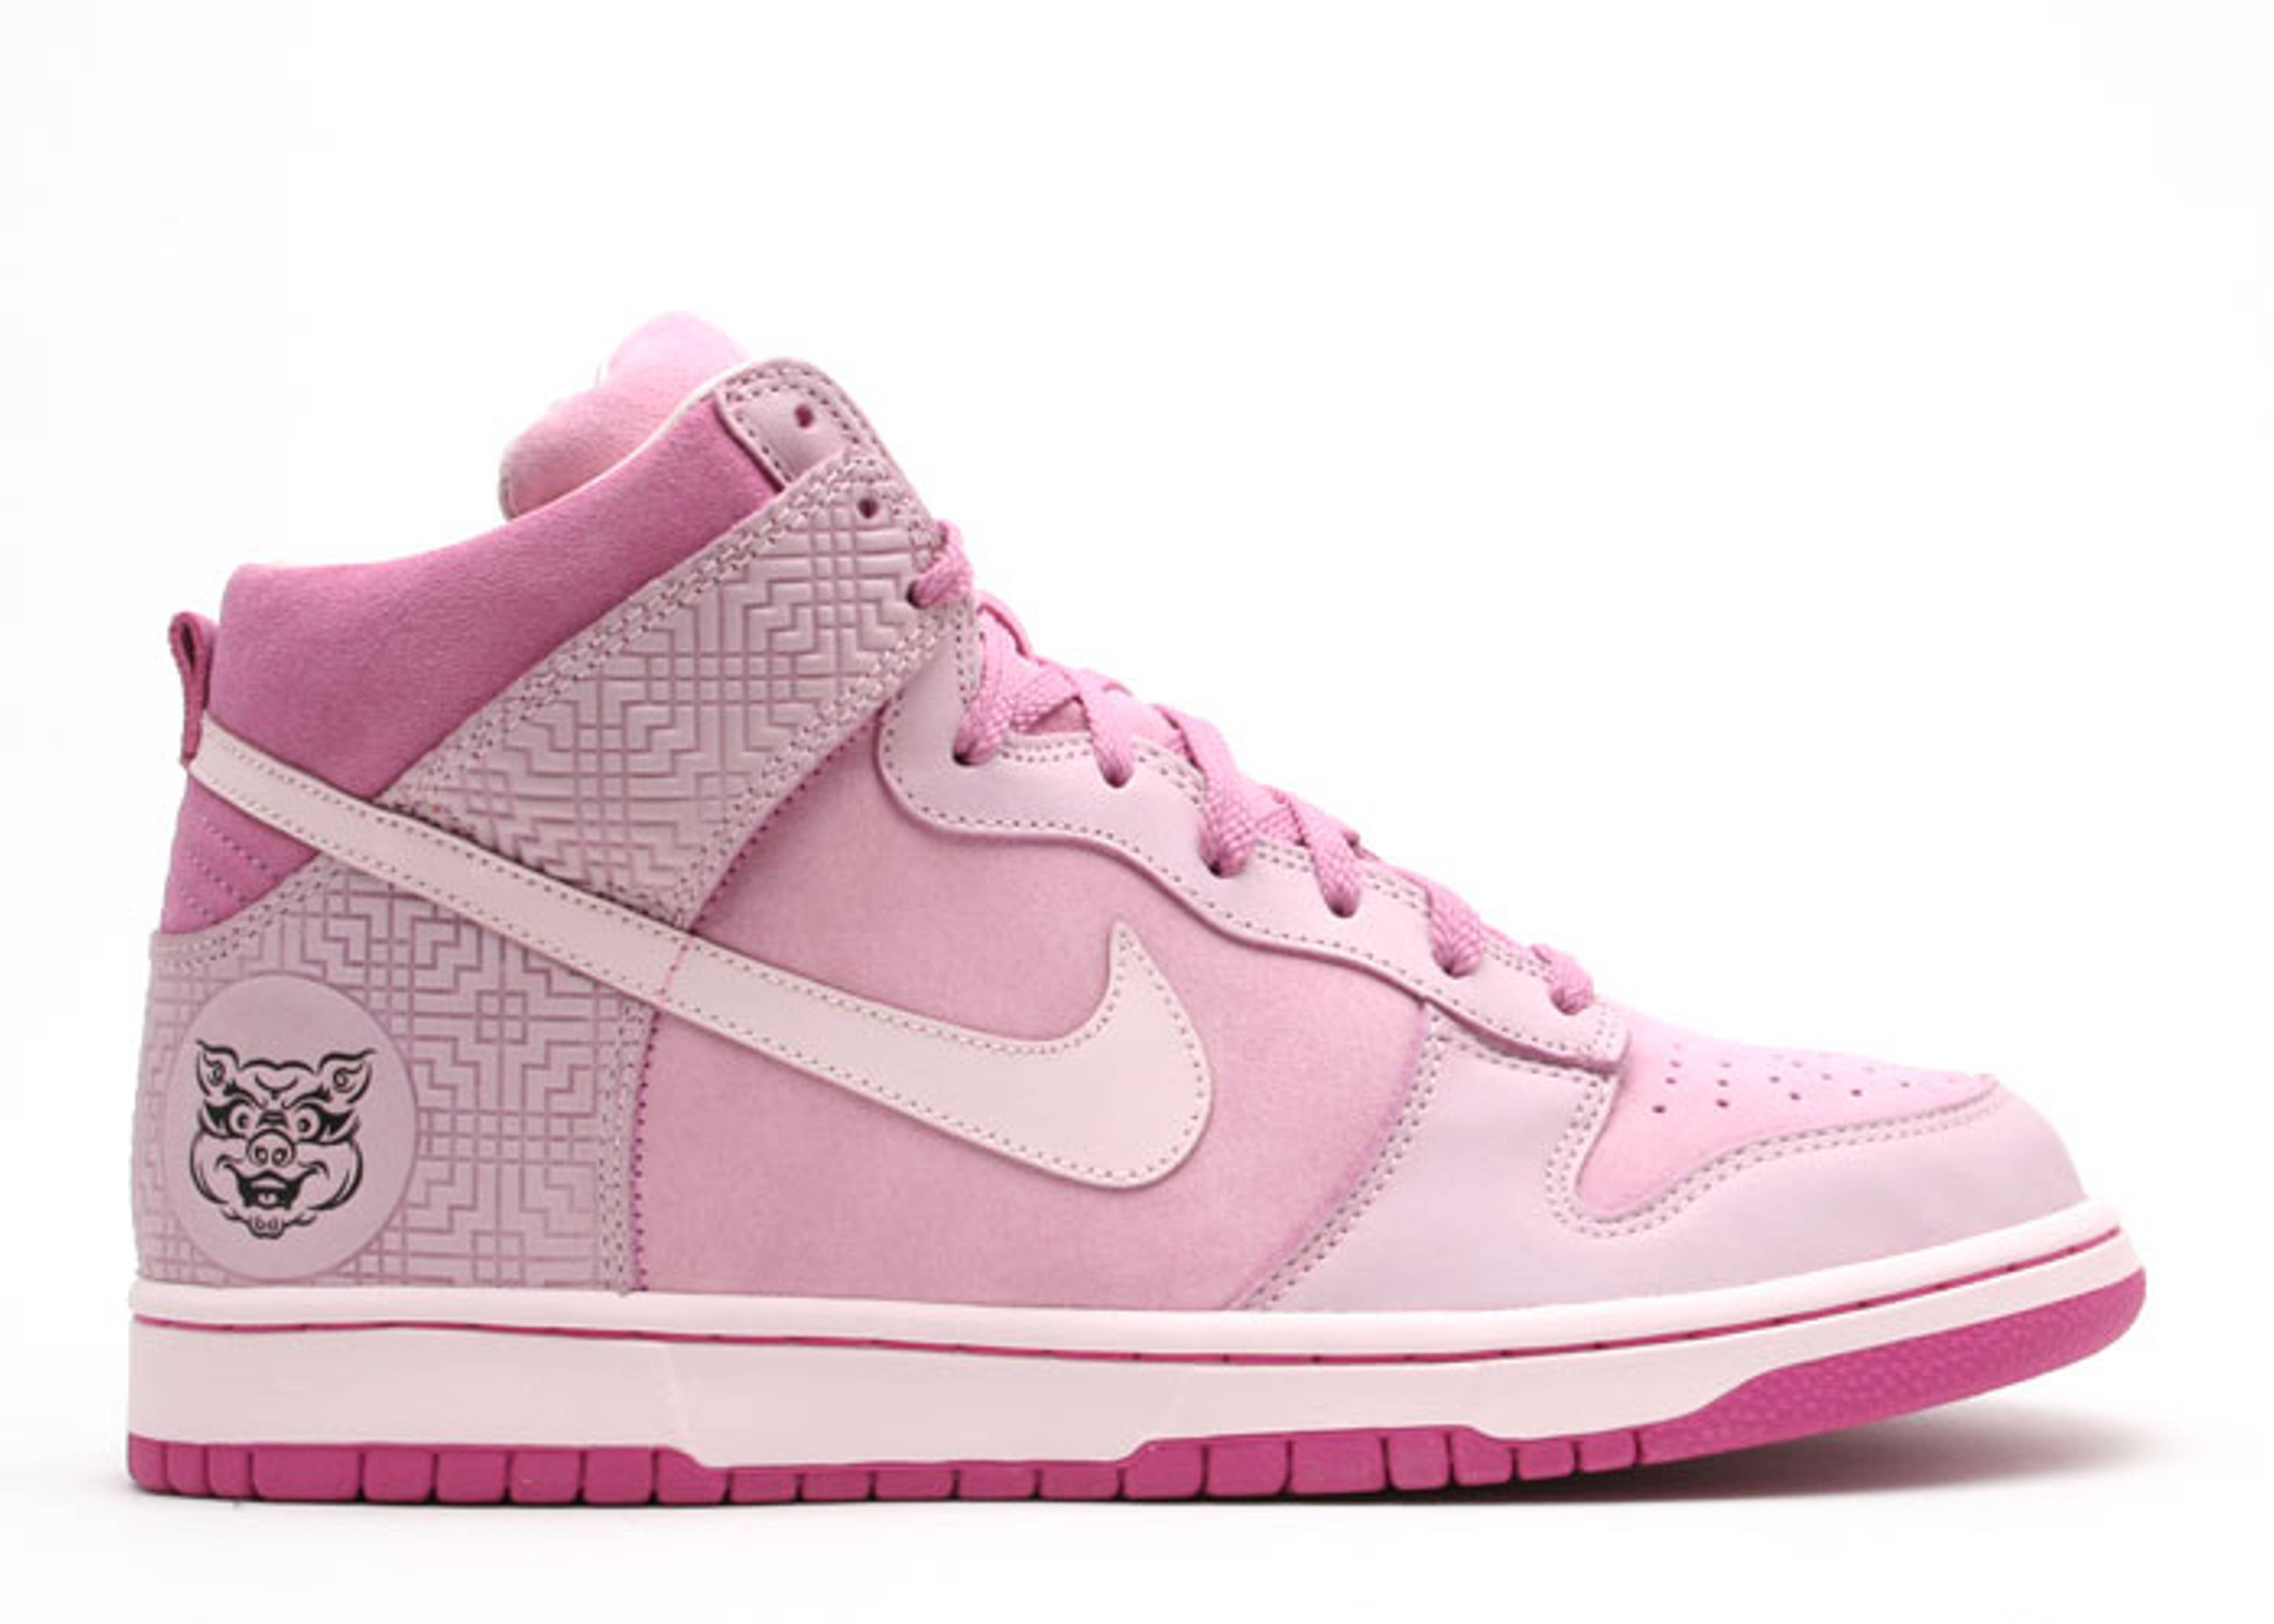 pink nike dunks high tops